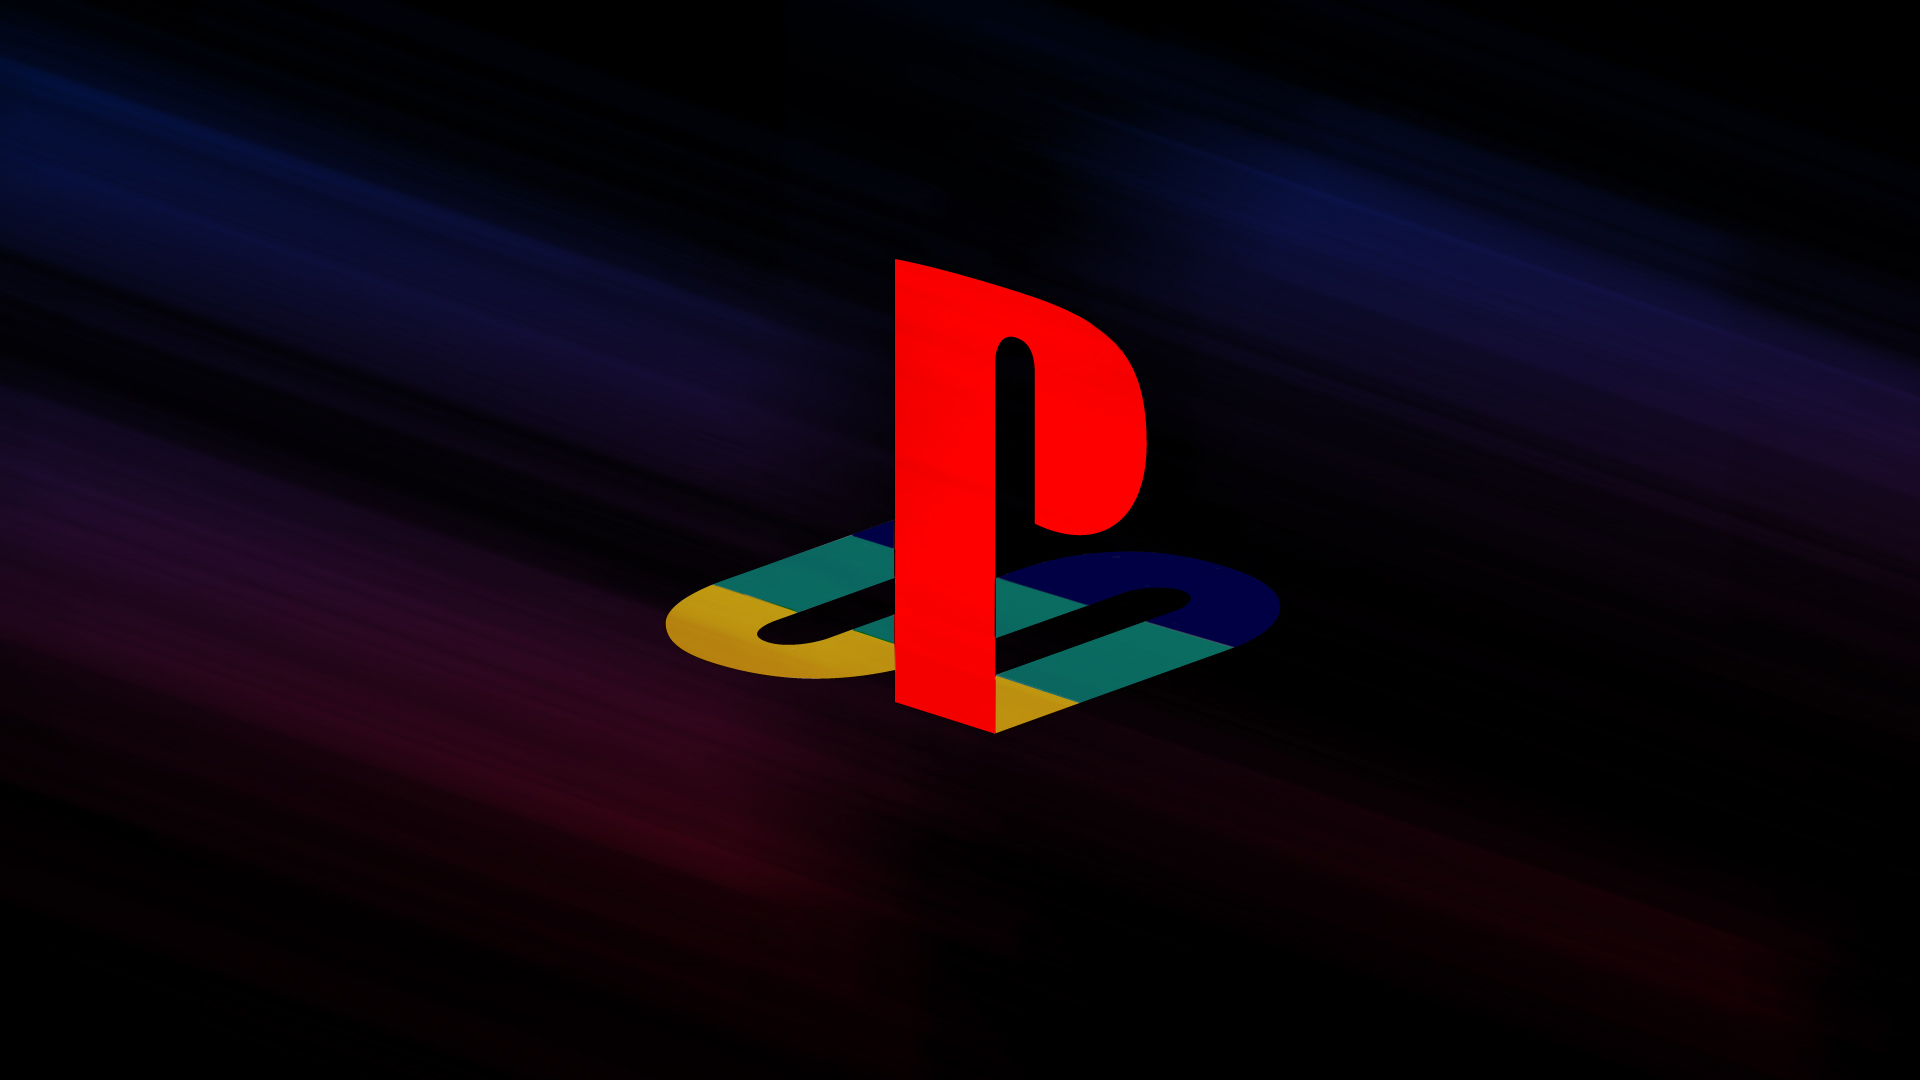 PlayStation wallpaper   PlayStation 1 PSX Wallpaper 34563519 1920x1080